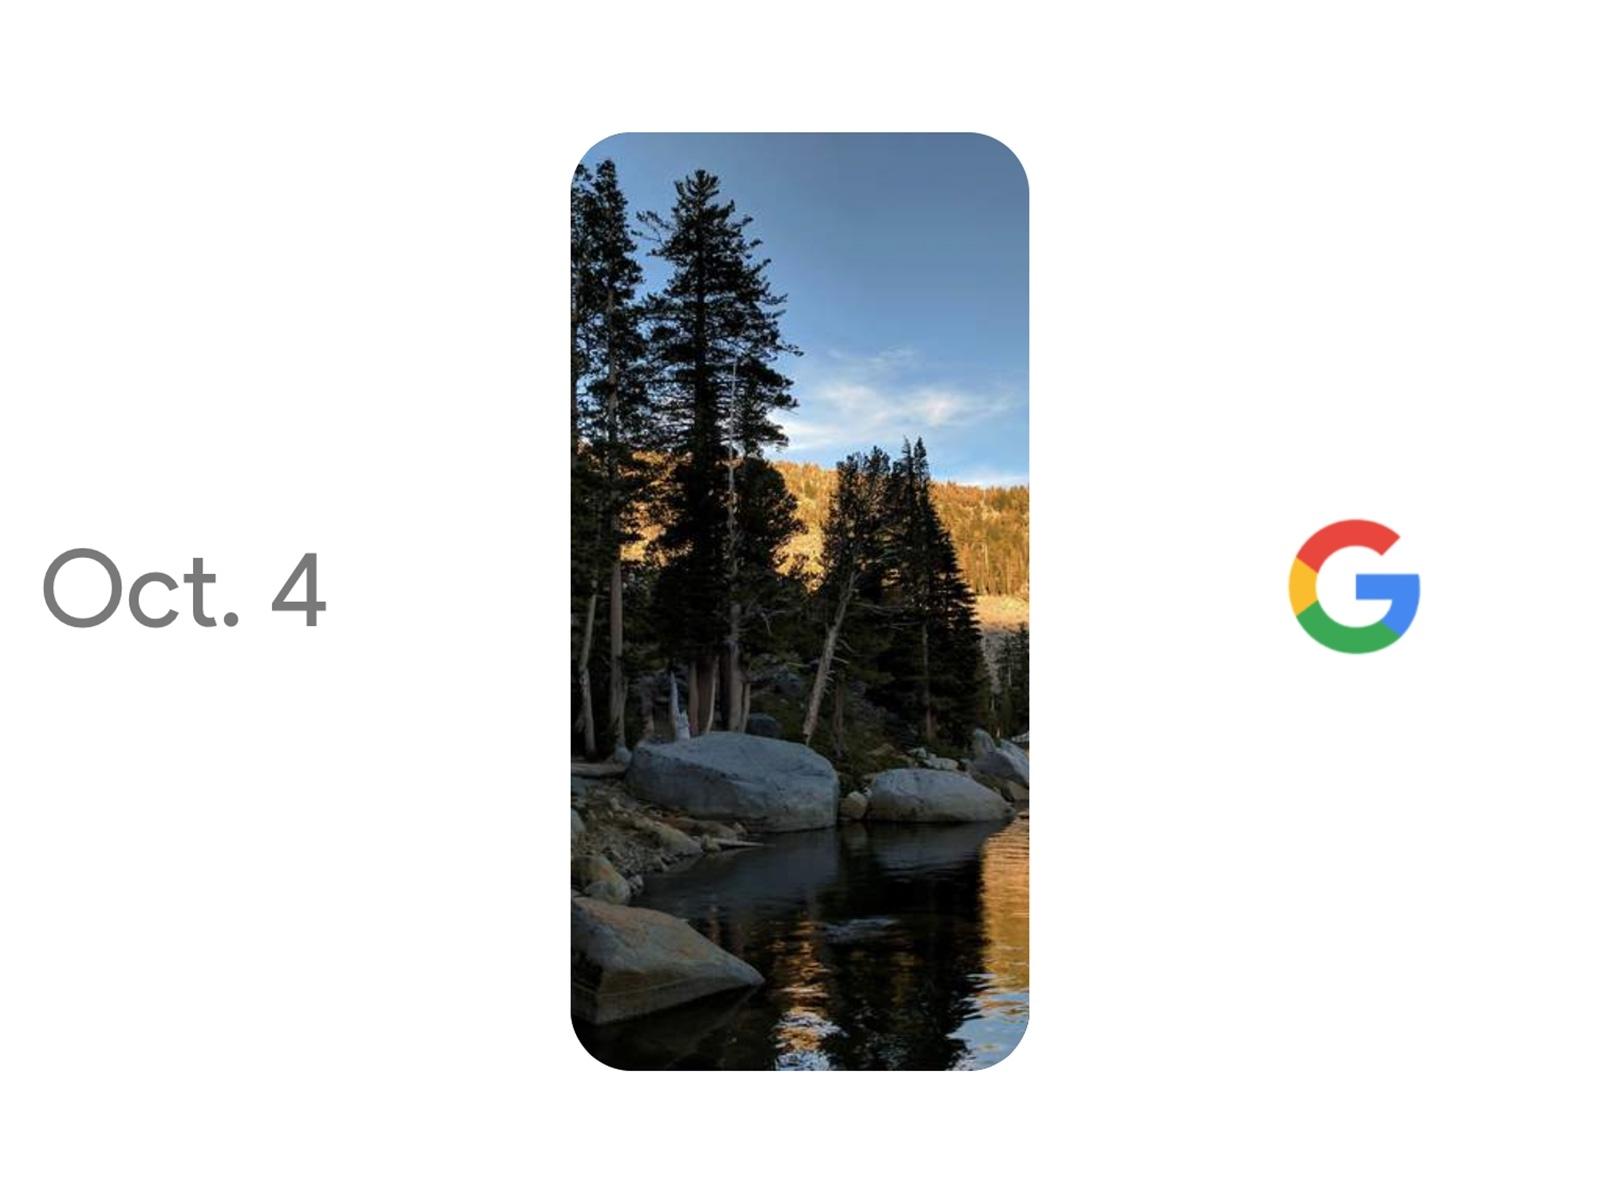 Google Oct. 4